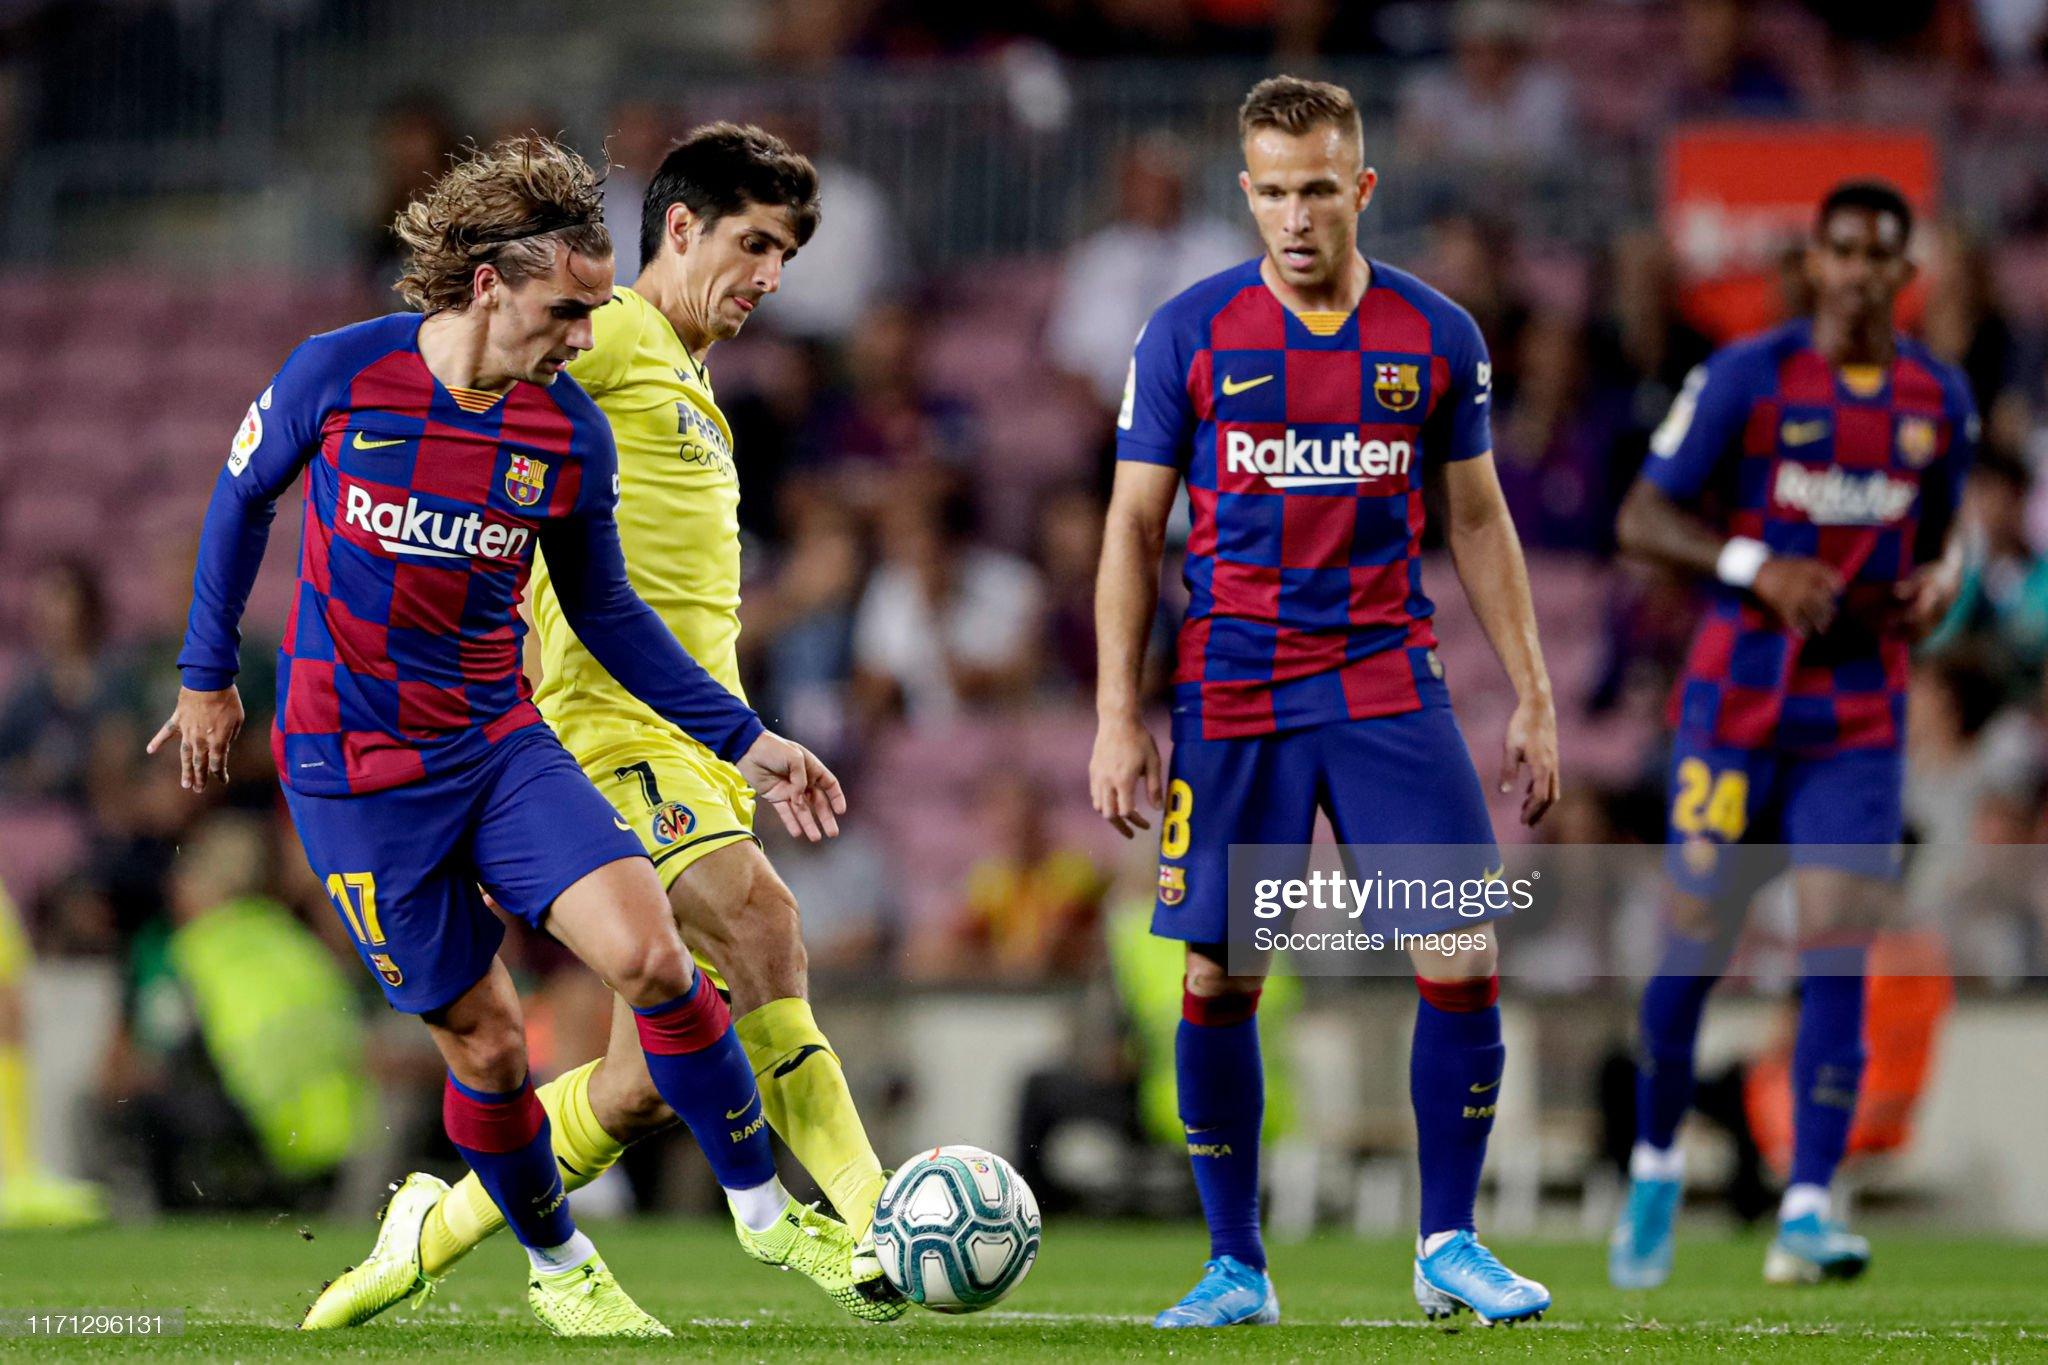 صور مباراة : برشلونة - فياريال 2-1 ( 24-09-2019 )  Antoine-griezmann-of-fc-barcelona-gerard-moreno-of-villarreal-during-picture-id1171296131?s=2048x2048